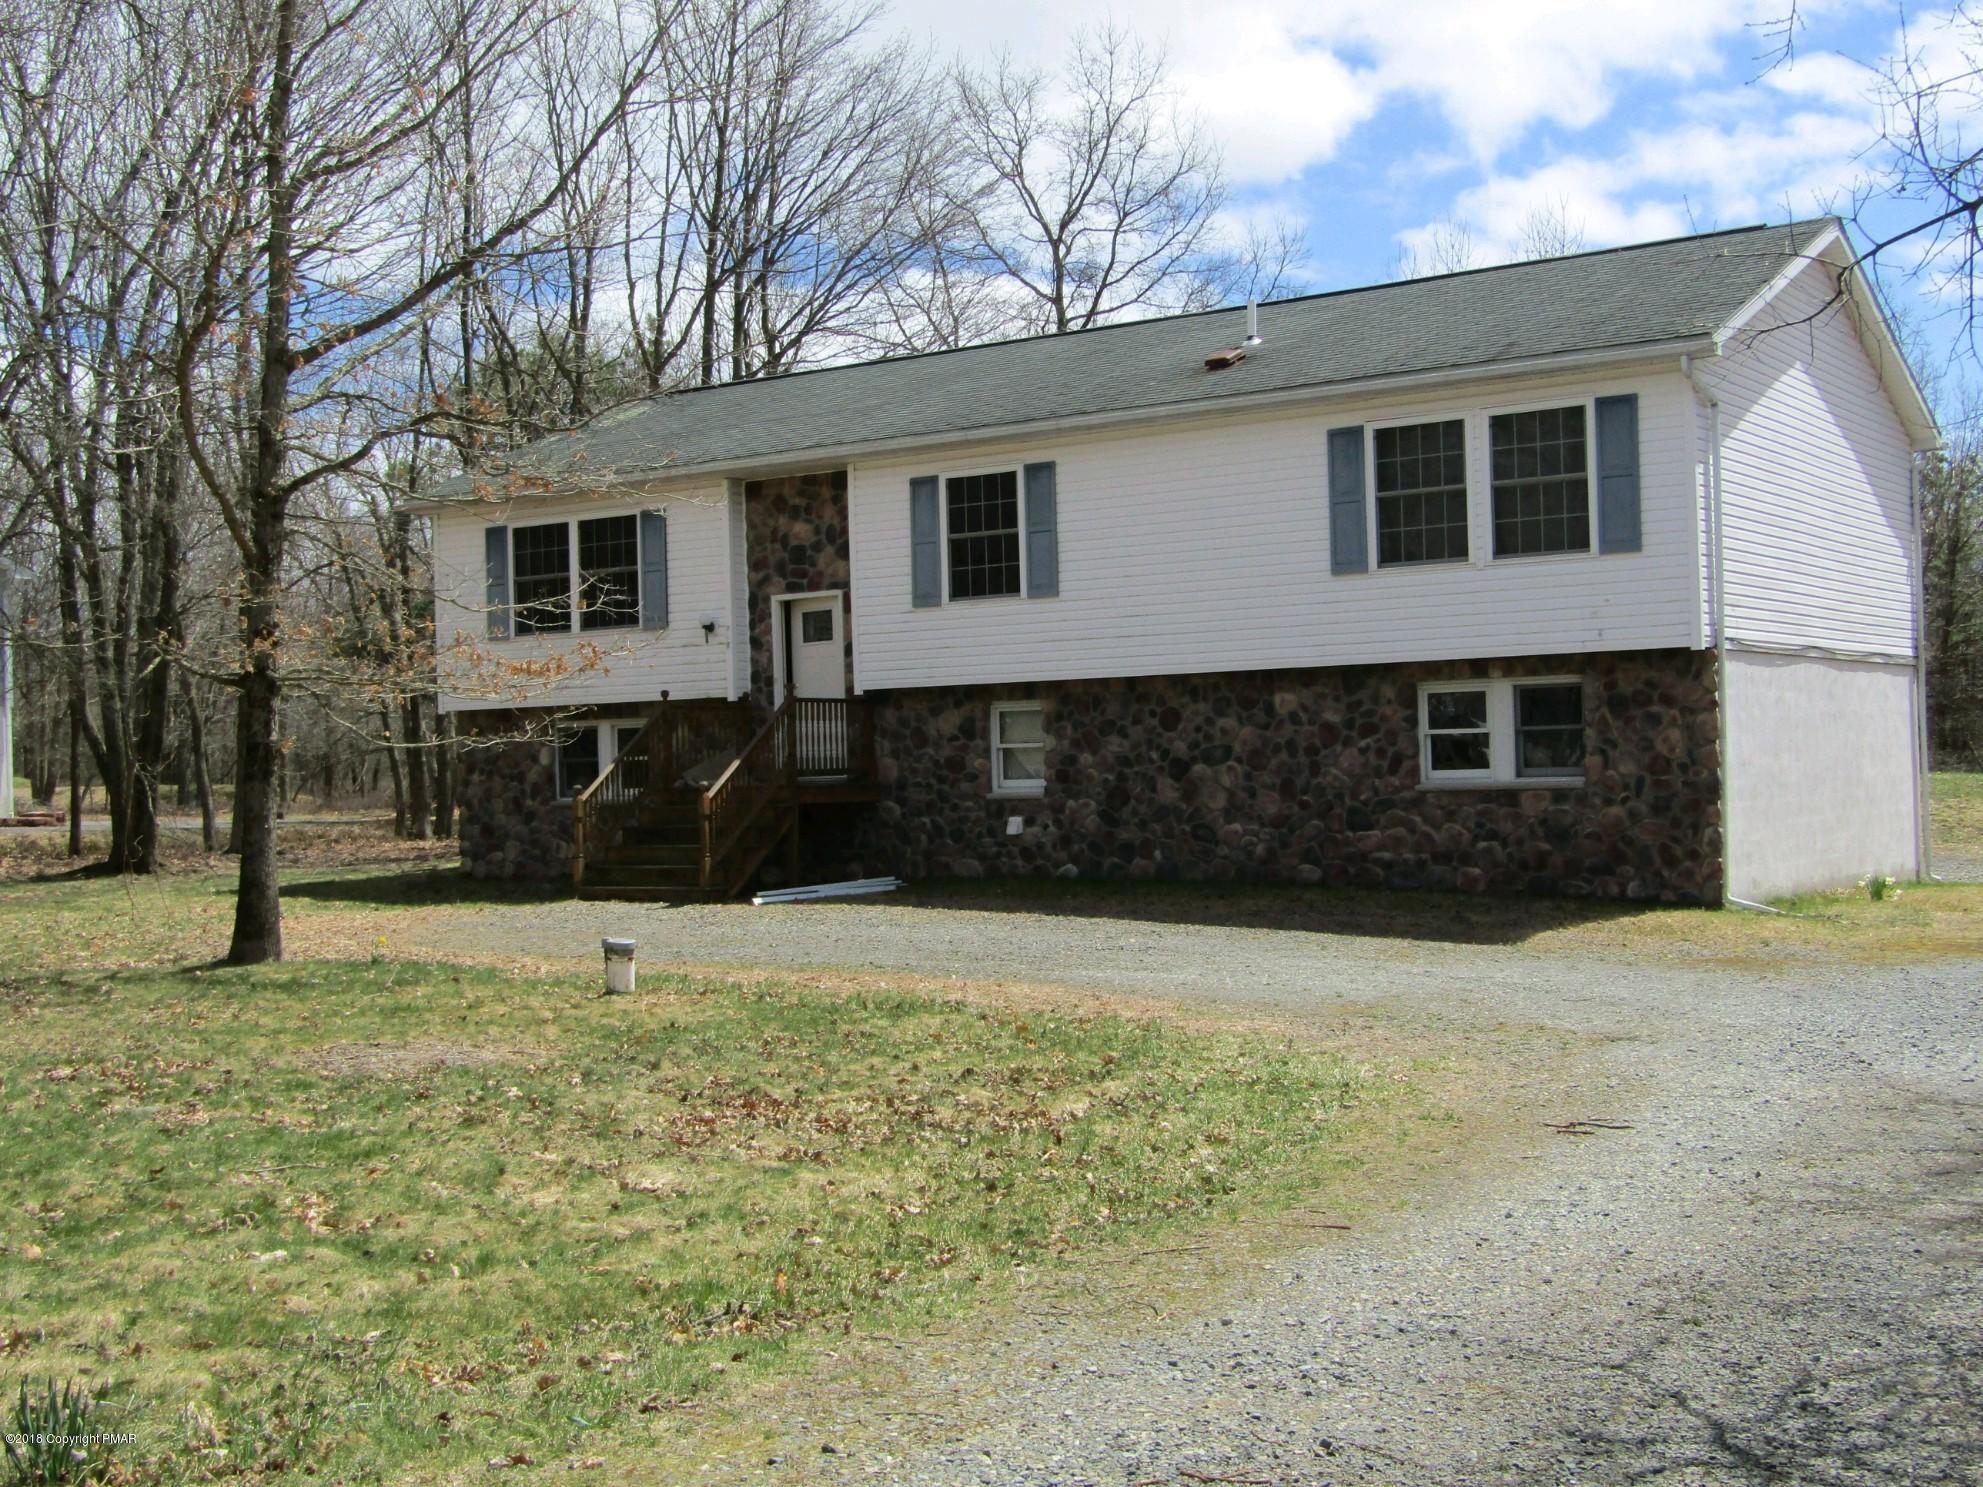 12 Penn Forest Dr., Albrightsville, PA 18210